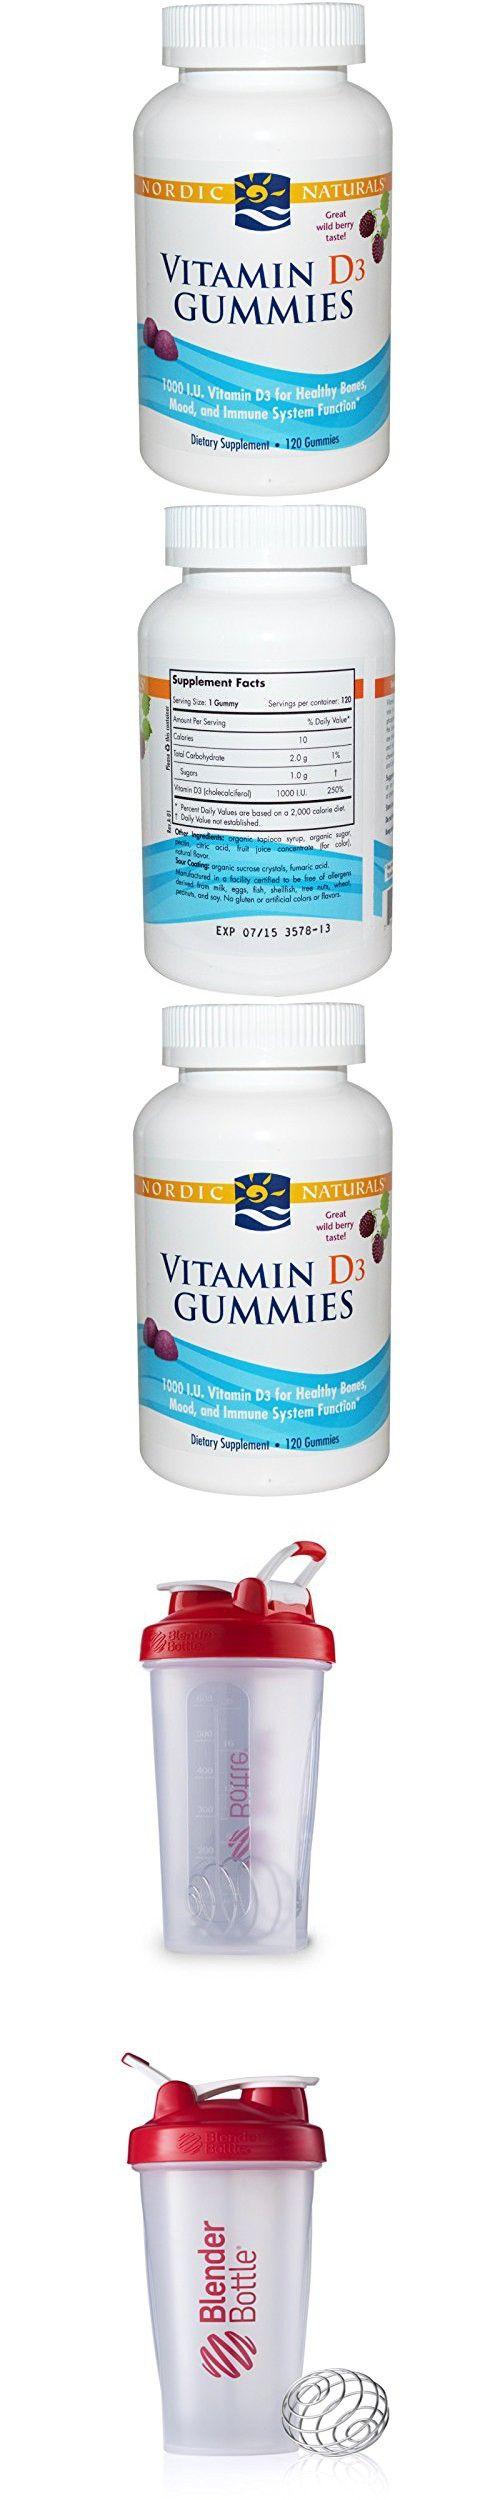 Best Nordic Naturals, Vitamin D3 Gummies, Wild Berry, 1000 IU, 120 Gummies, Sundesa, Classic Blender Bottle with Loop, Red, 28 oz Bottle